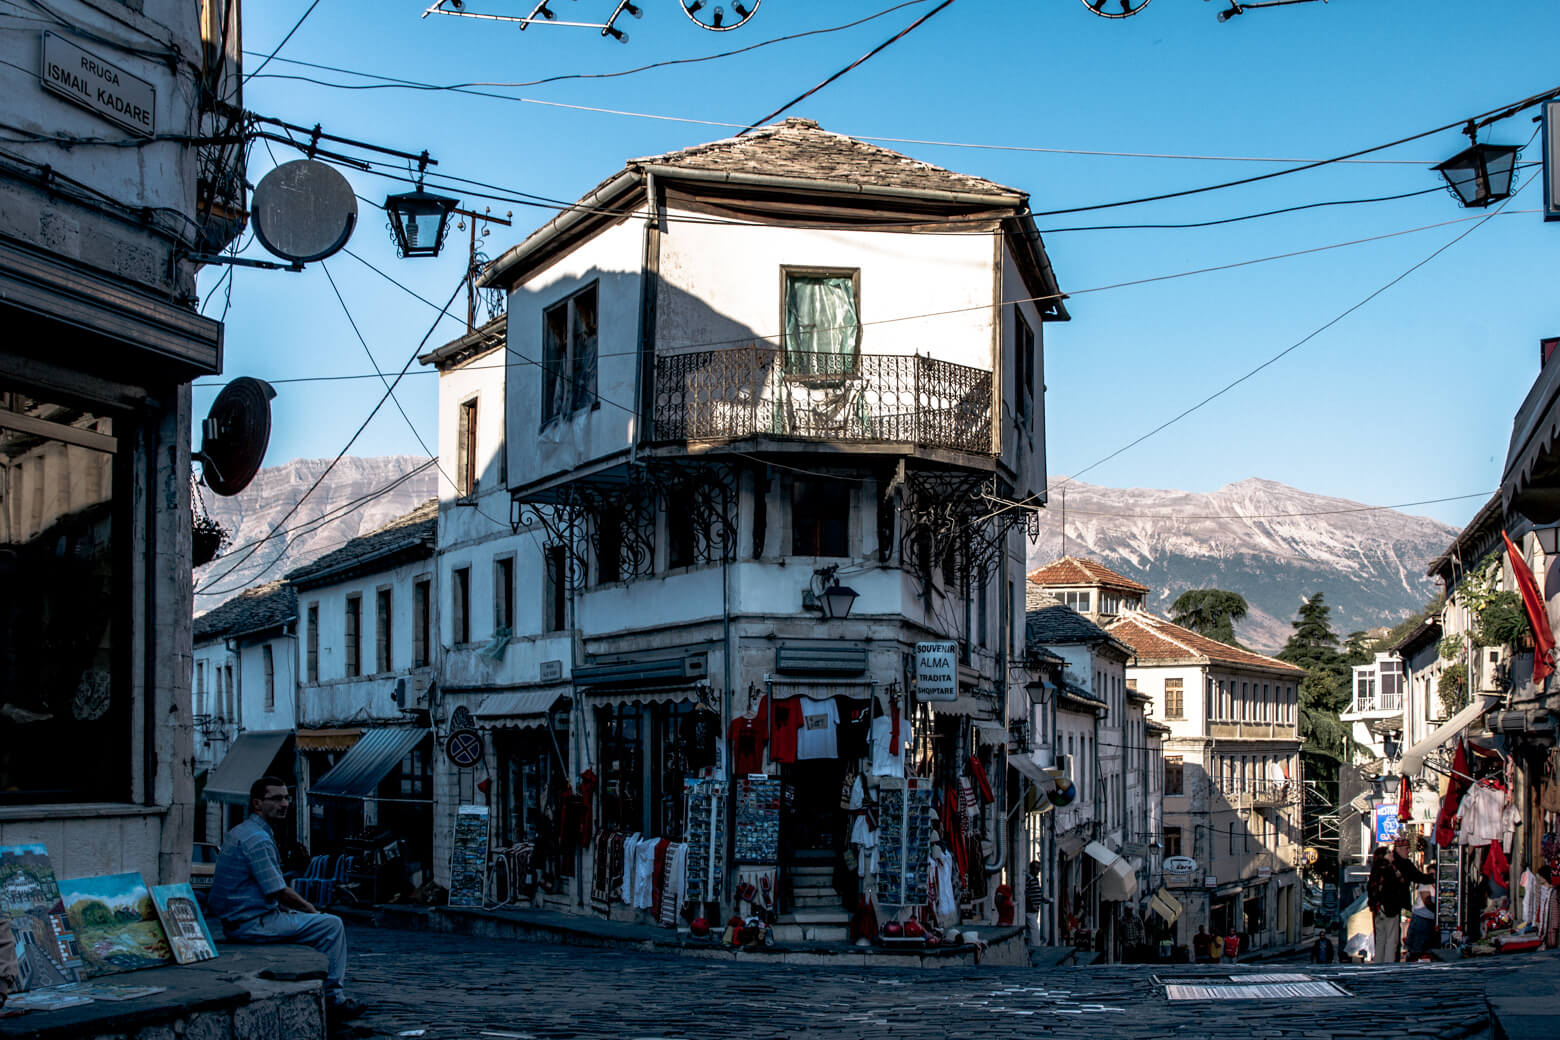 Streets of Gjirokastra